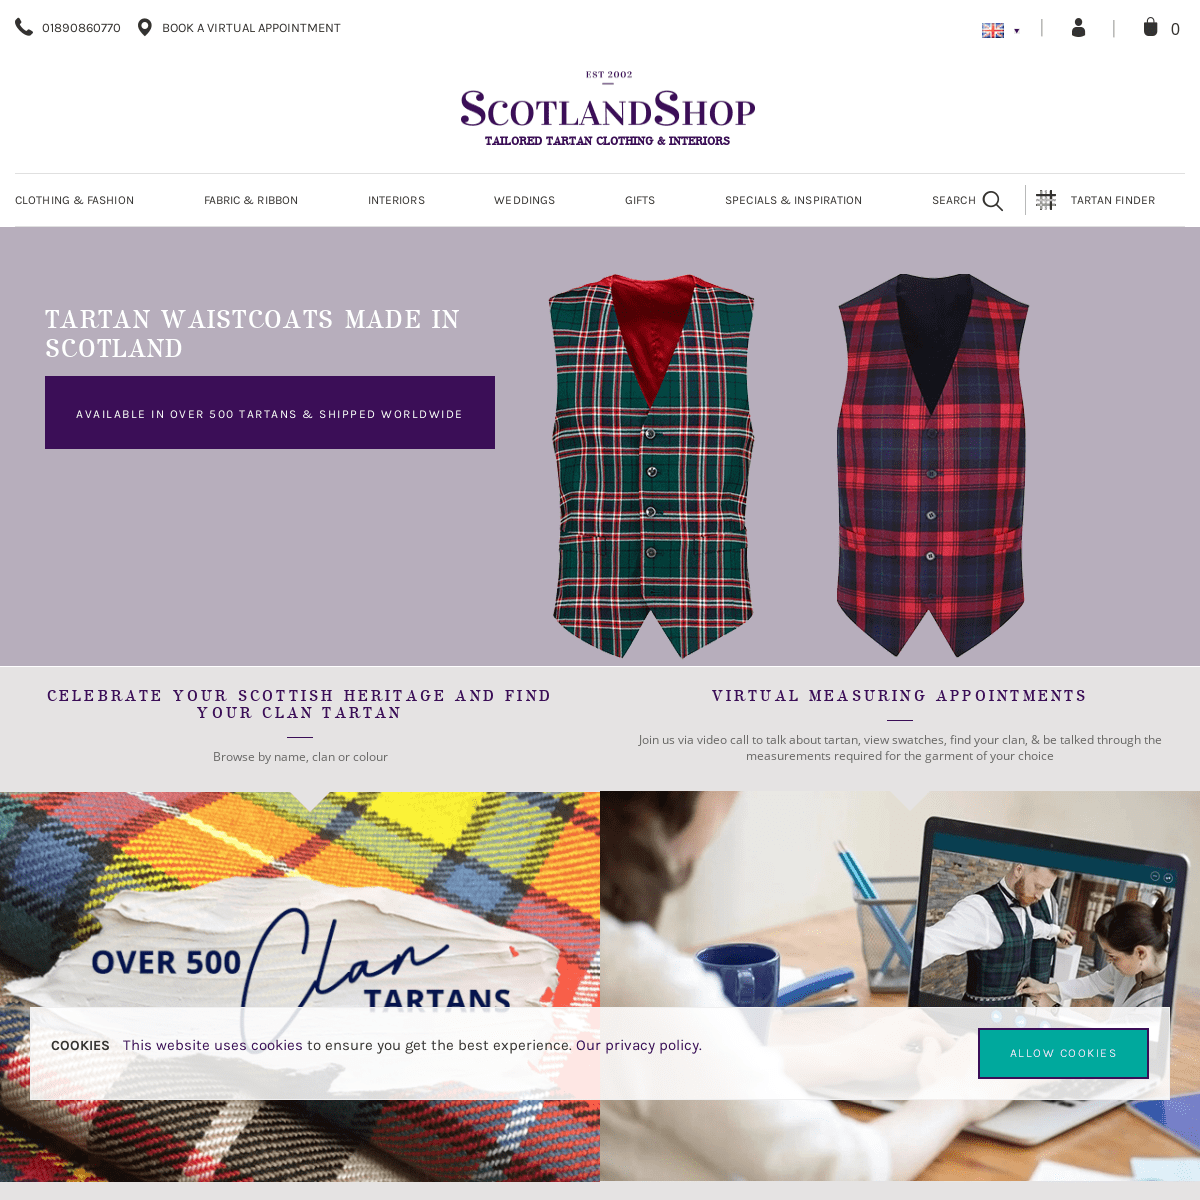 Scotland Shop - Tartan Gifts & Accessories - Made in Scotland